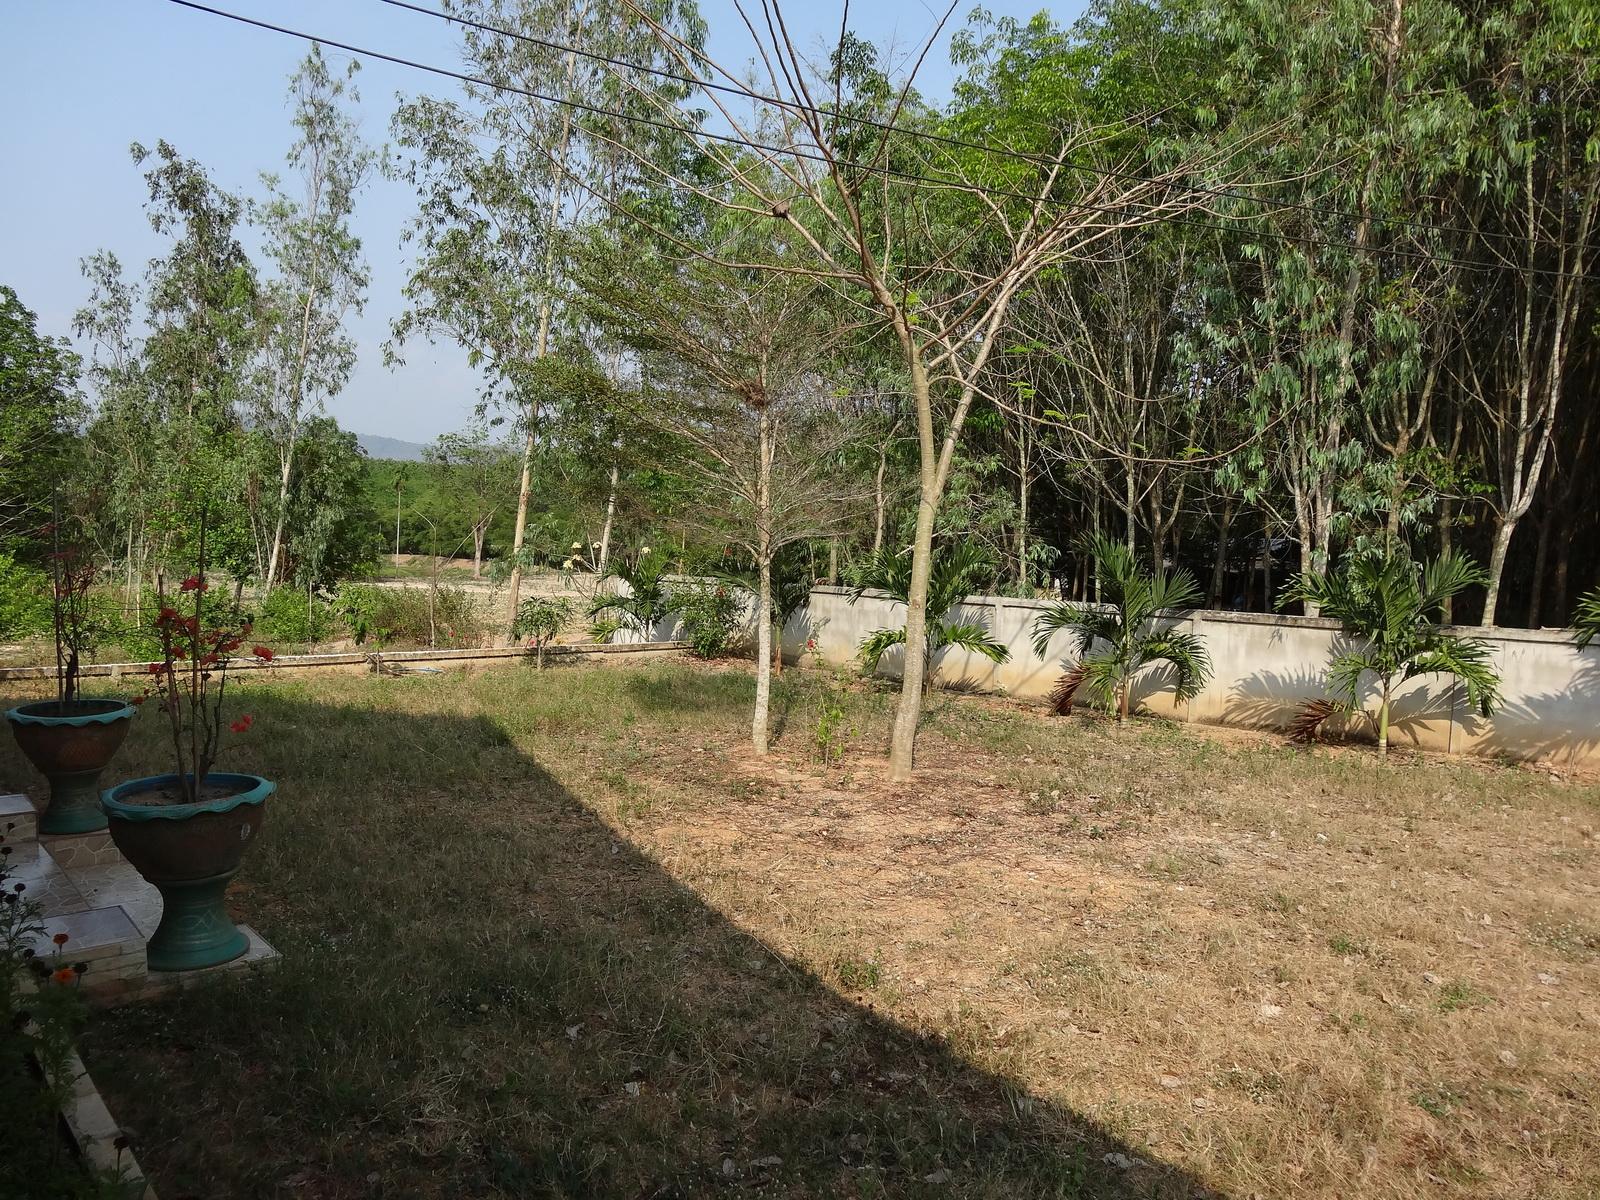 01 Pattaya 056